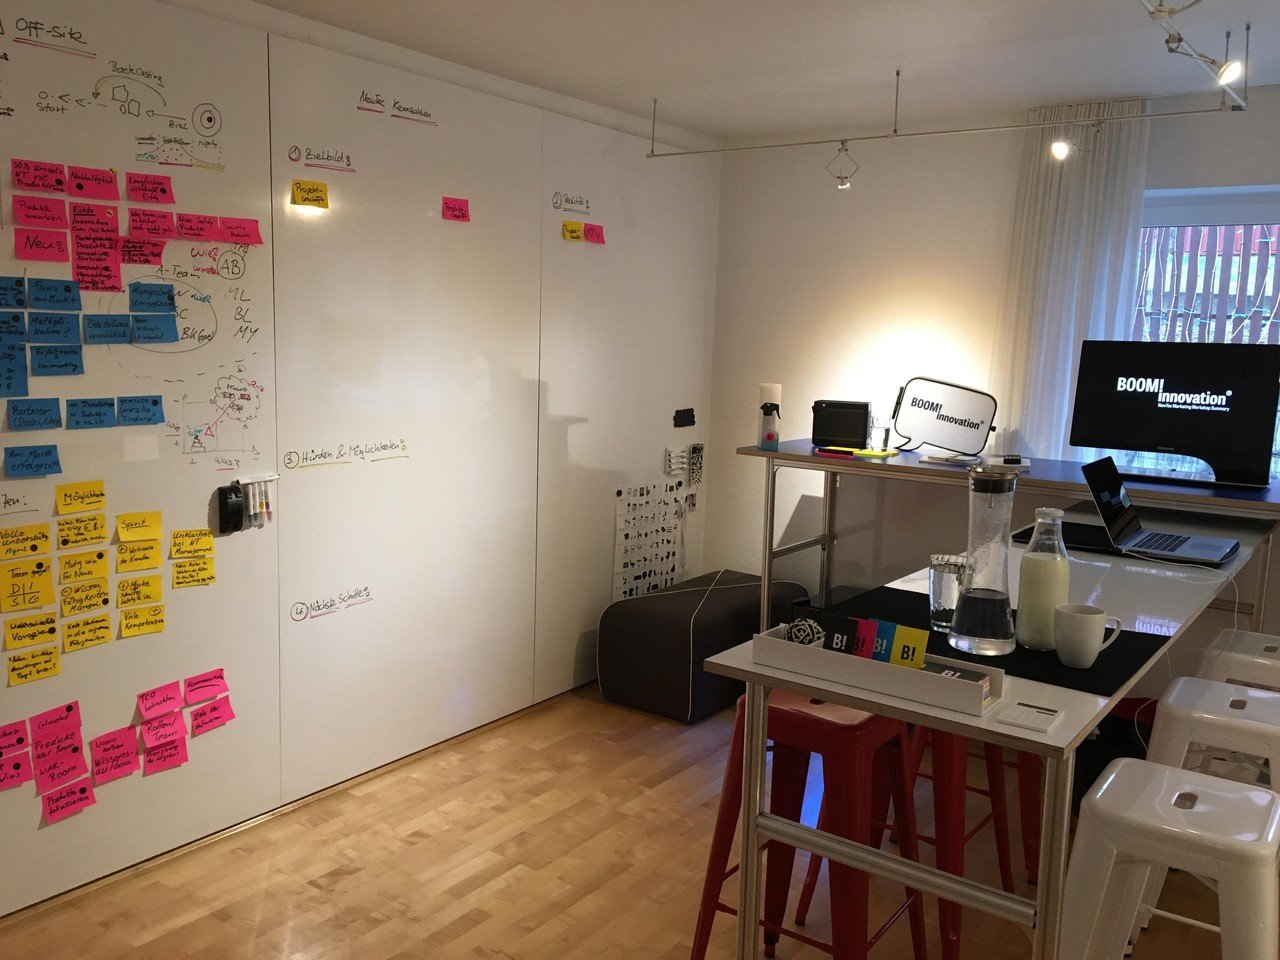 München  Meetingraum DesignWorks Space image 0